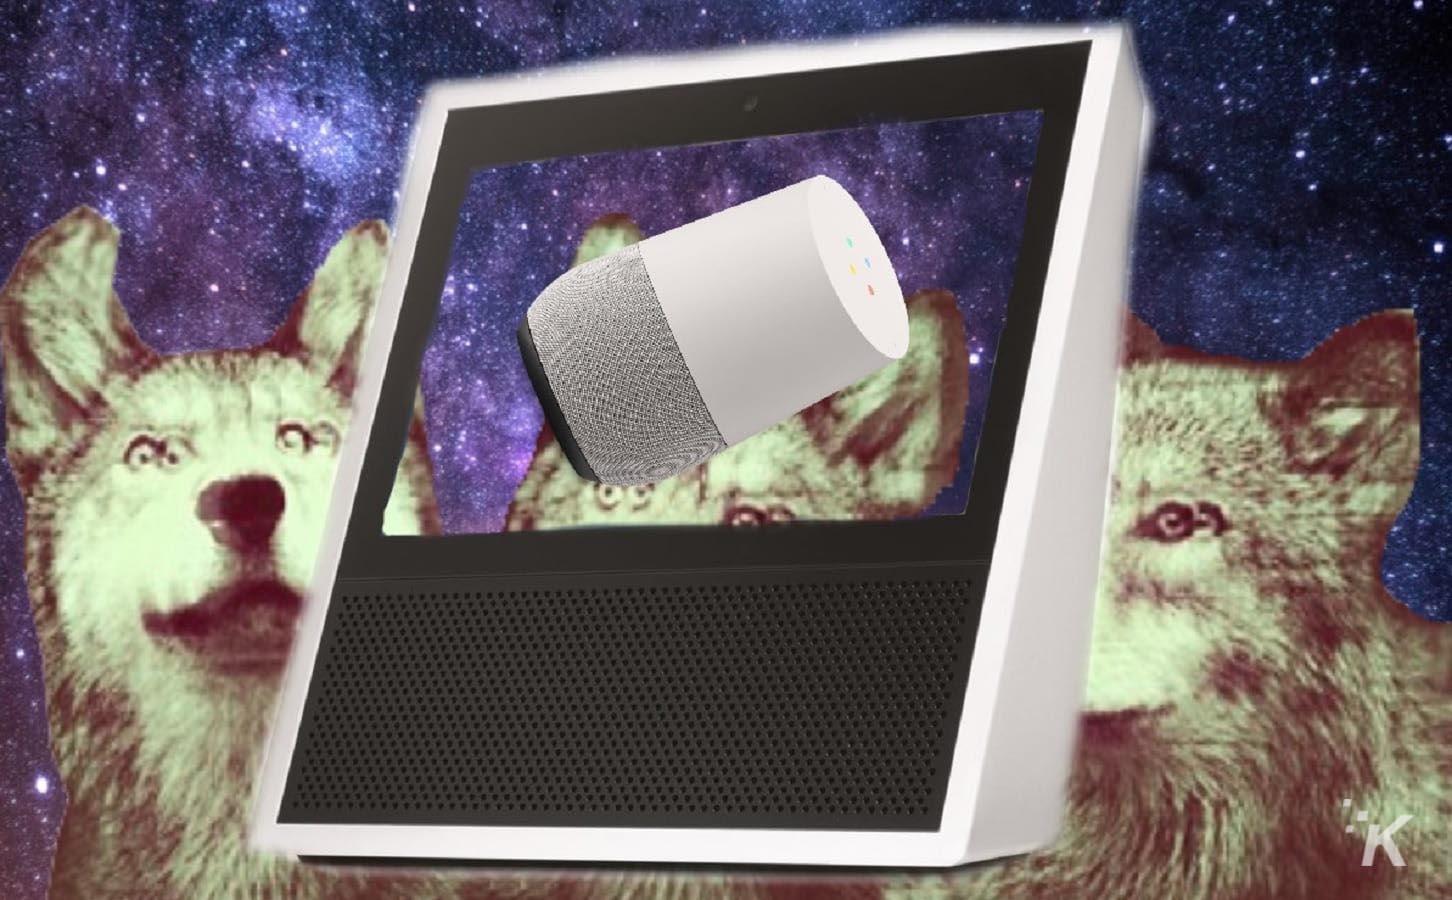 the universe of smart home tech